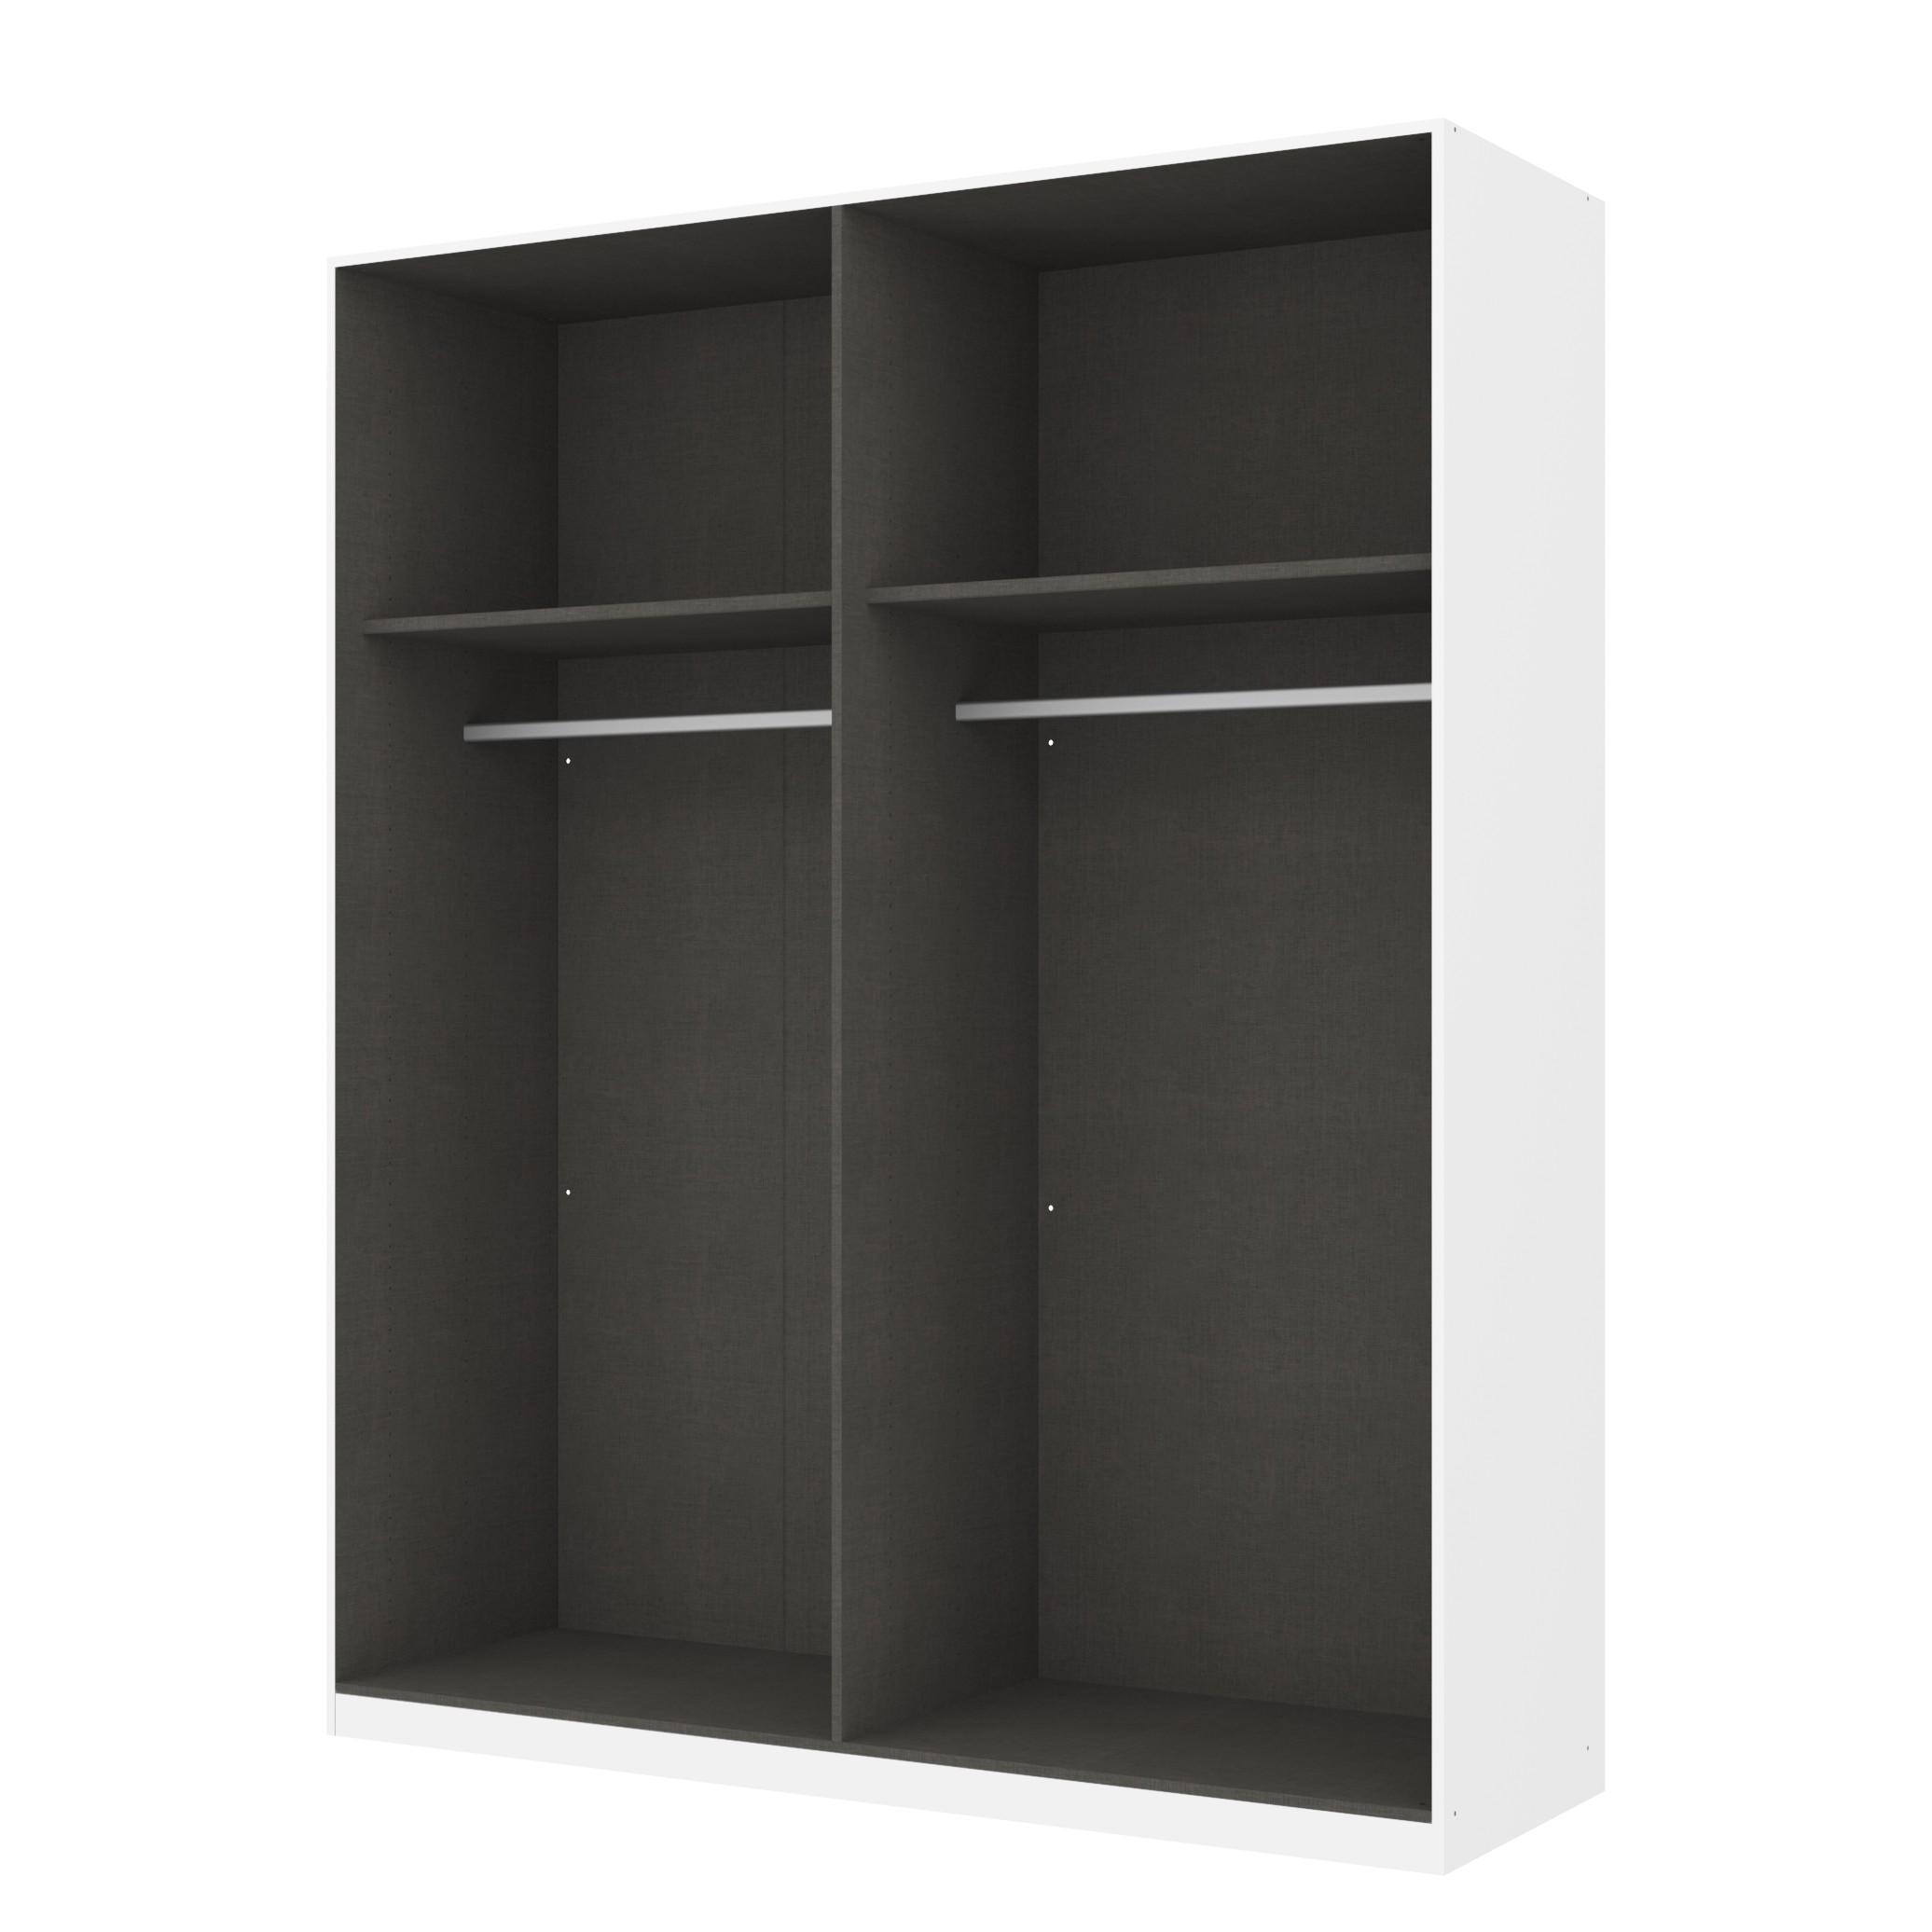 Armoire sans porte Skøp - Blanc brillant - 181 cm (4 portes) - 222 cm - Basic, SKØP